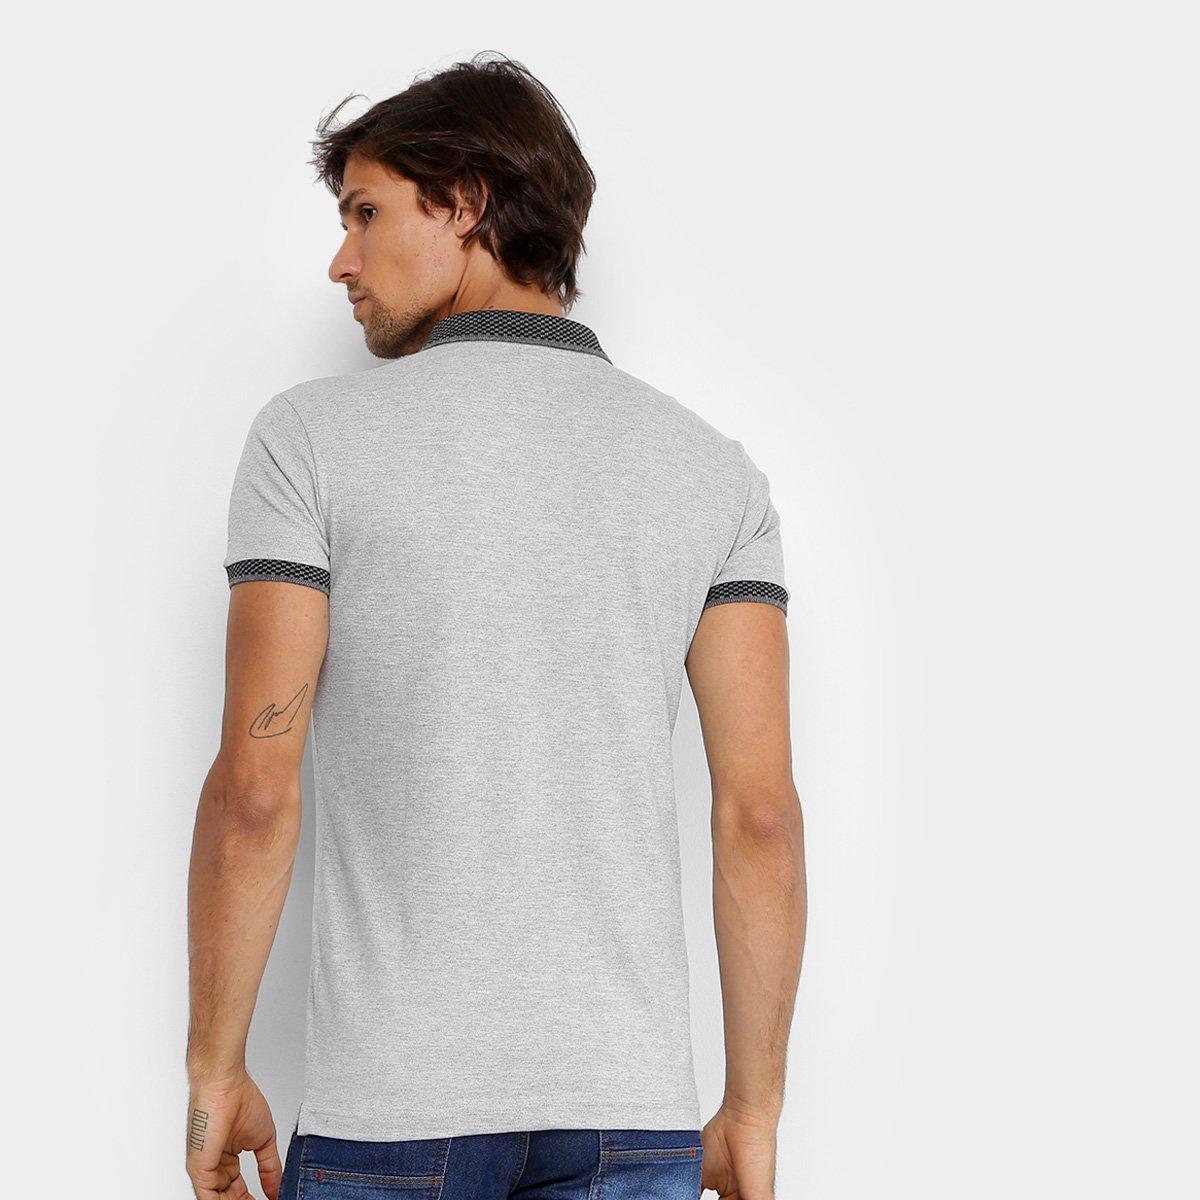 ... Camisa Polo RG 518 Lisa Gola Quadriculada Logo Metalizada Masculina ... 5e0261c3414cb